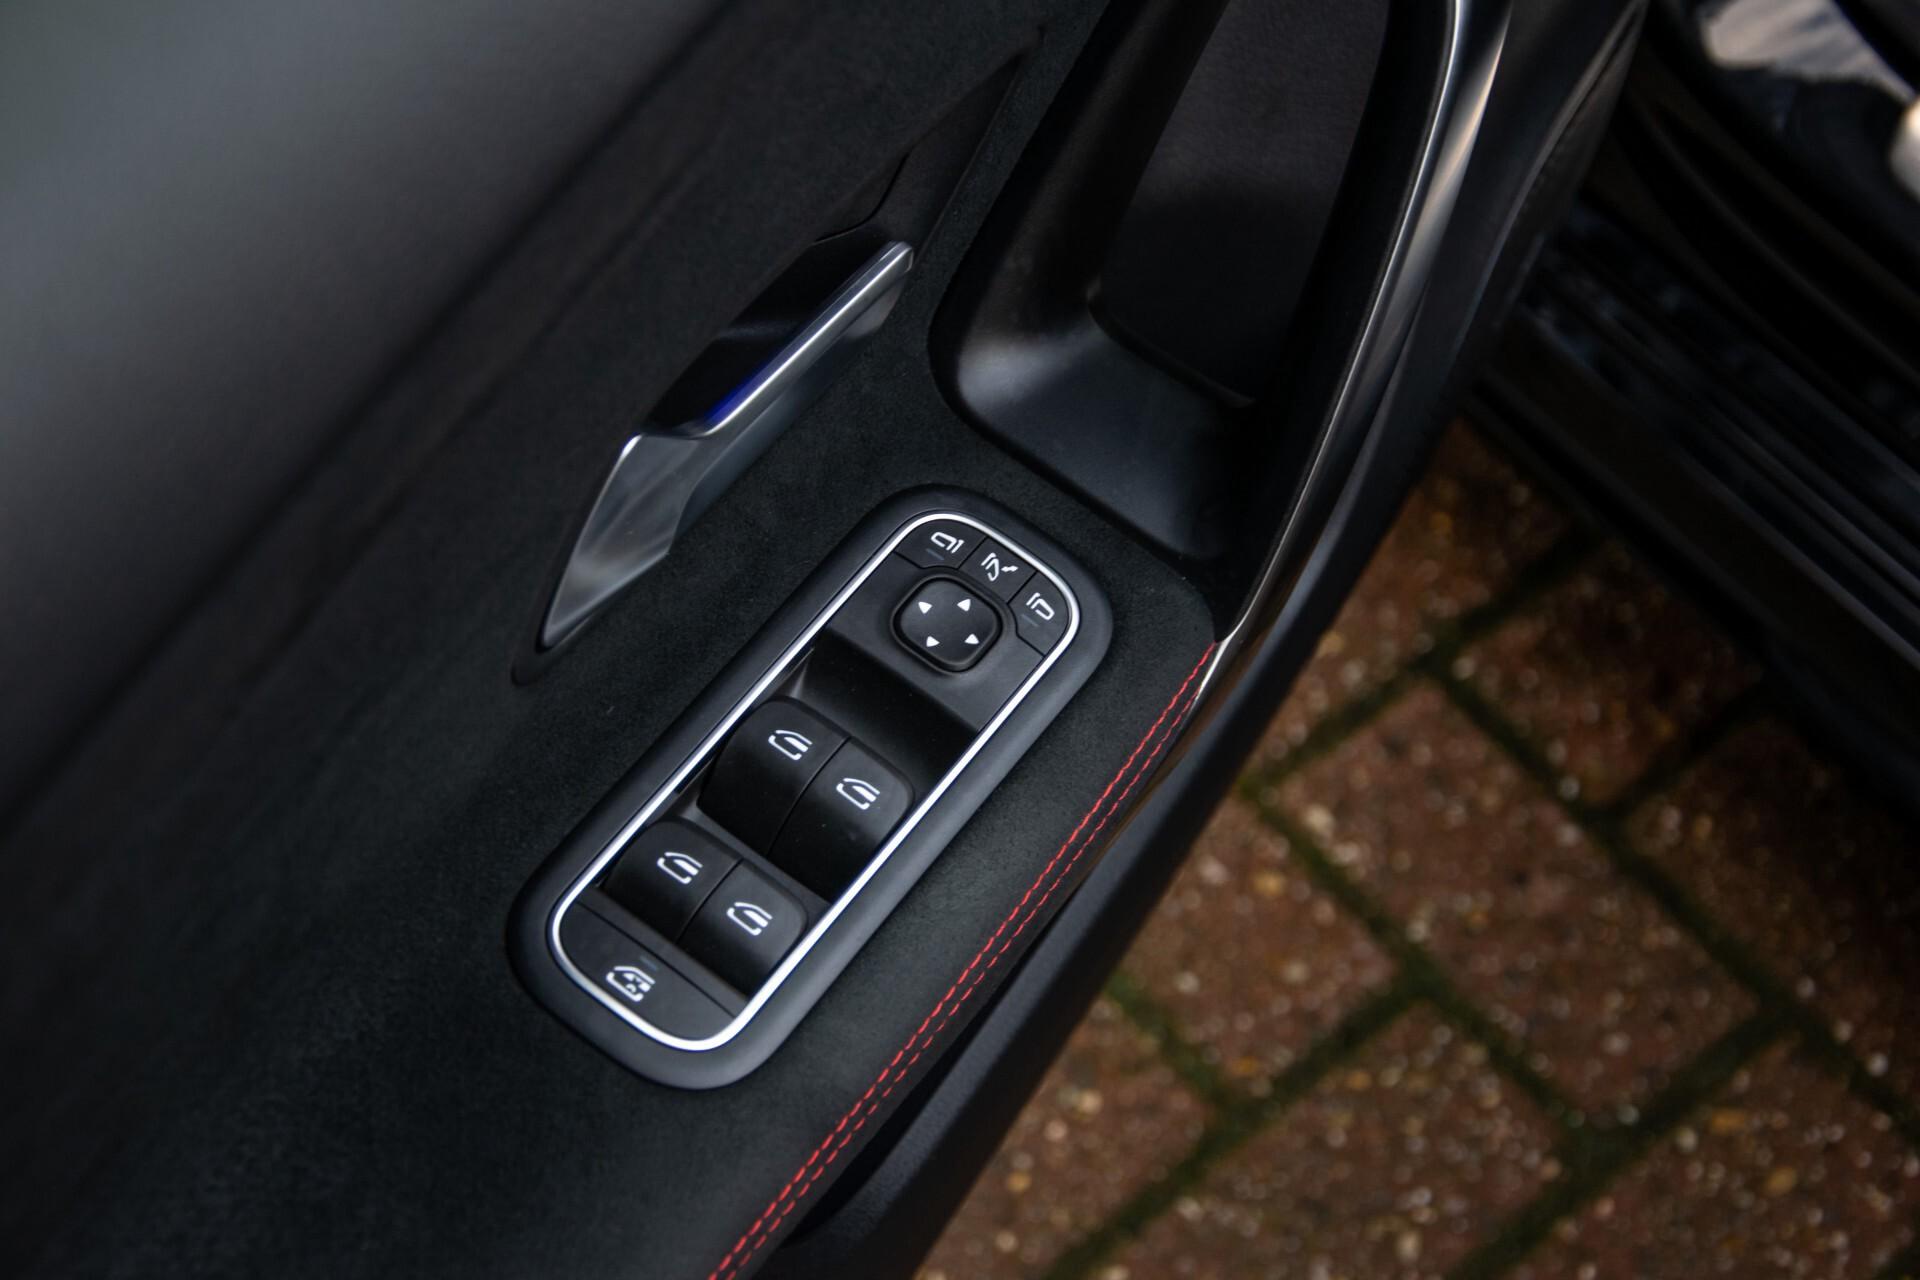 Mercedes-Benz A-Klasse 250 4-M AMG Panorama/Keyless-Entry/MBUX/HUD/Burmester/360/Multibeam LED Aut7 Foto 37